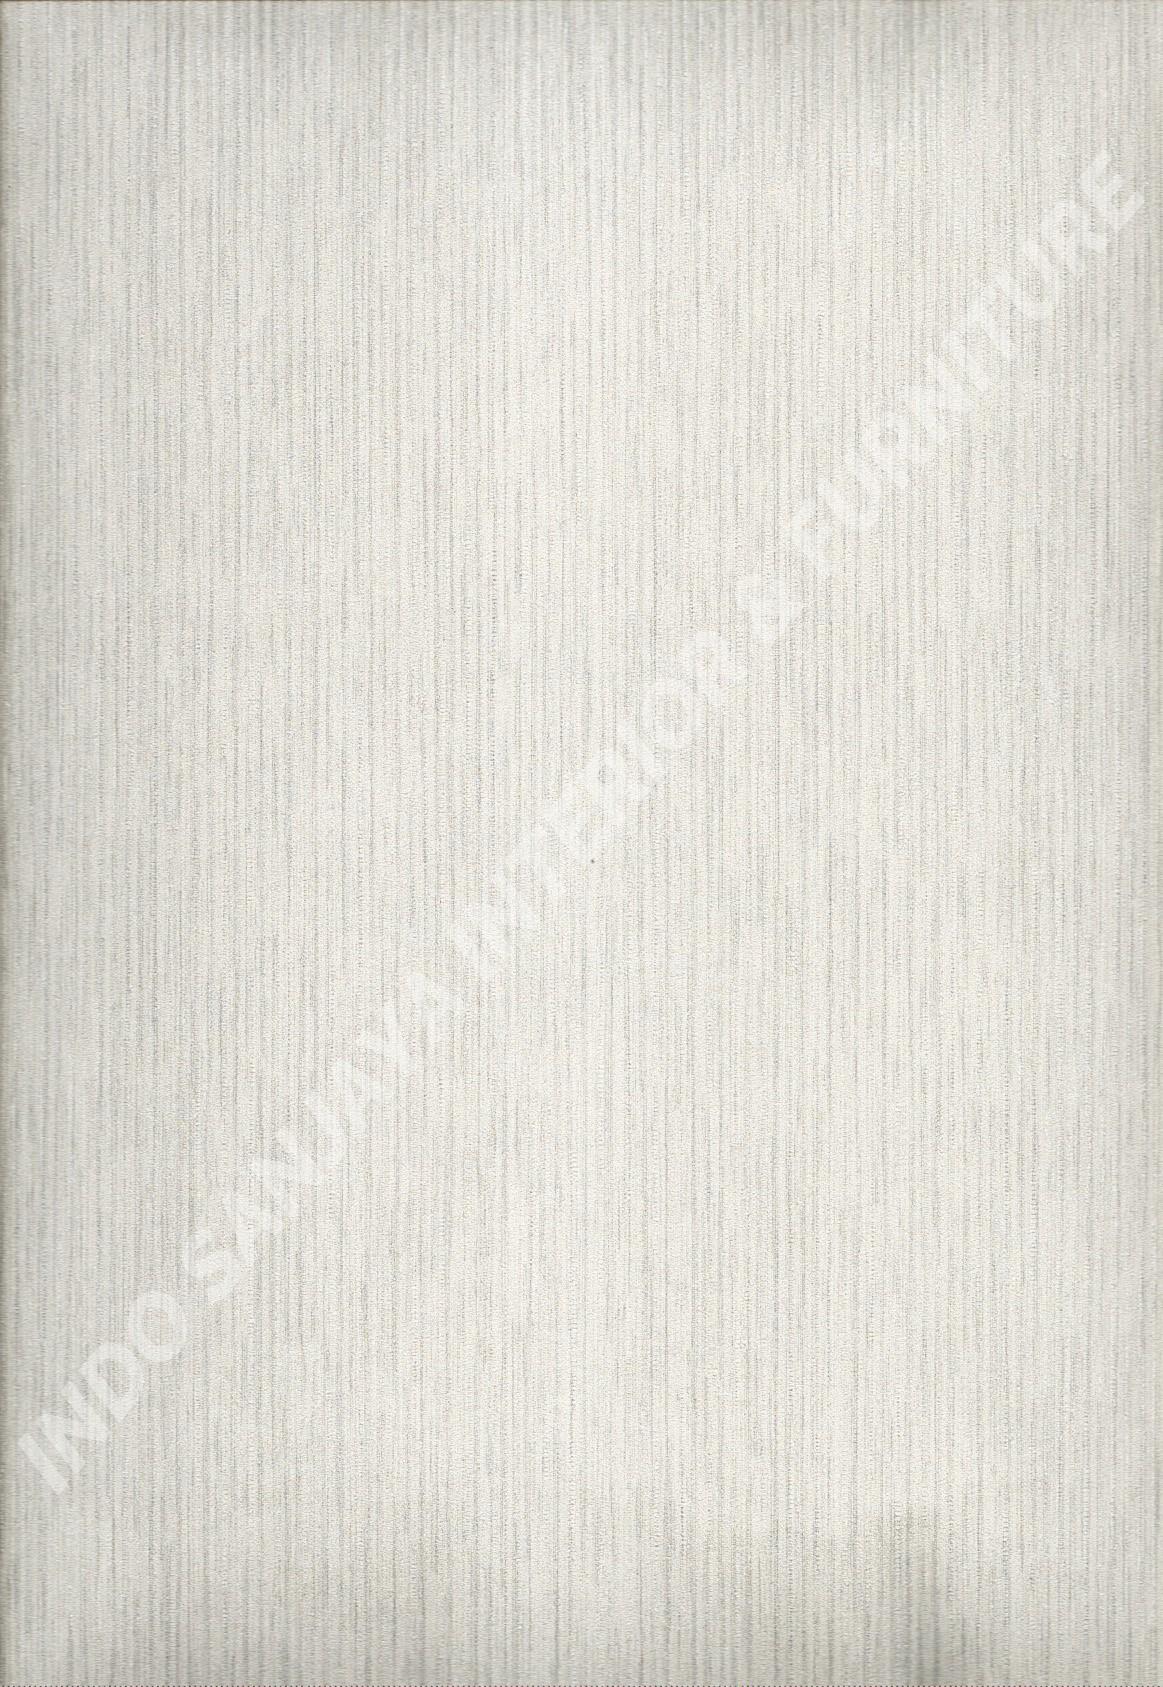 wallpaper   Wallpaper Minimalis Polos 87083:87083 corak  warna